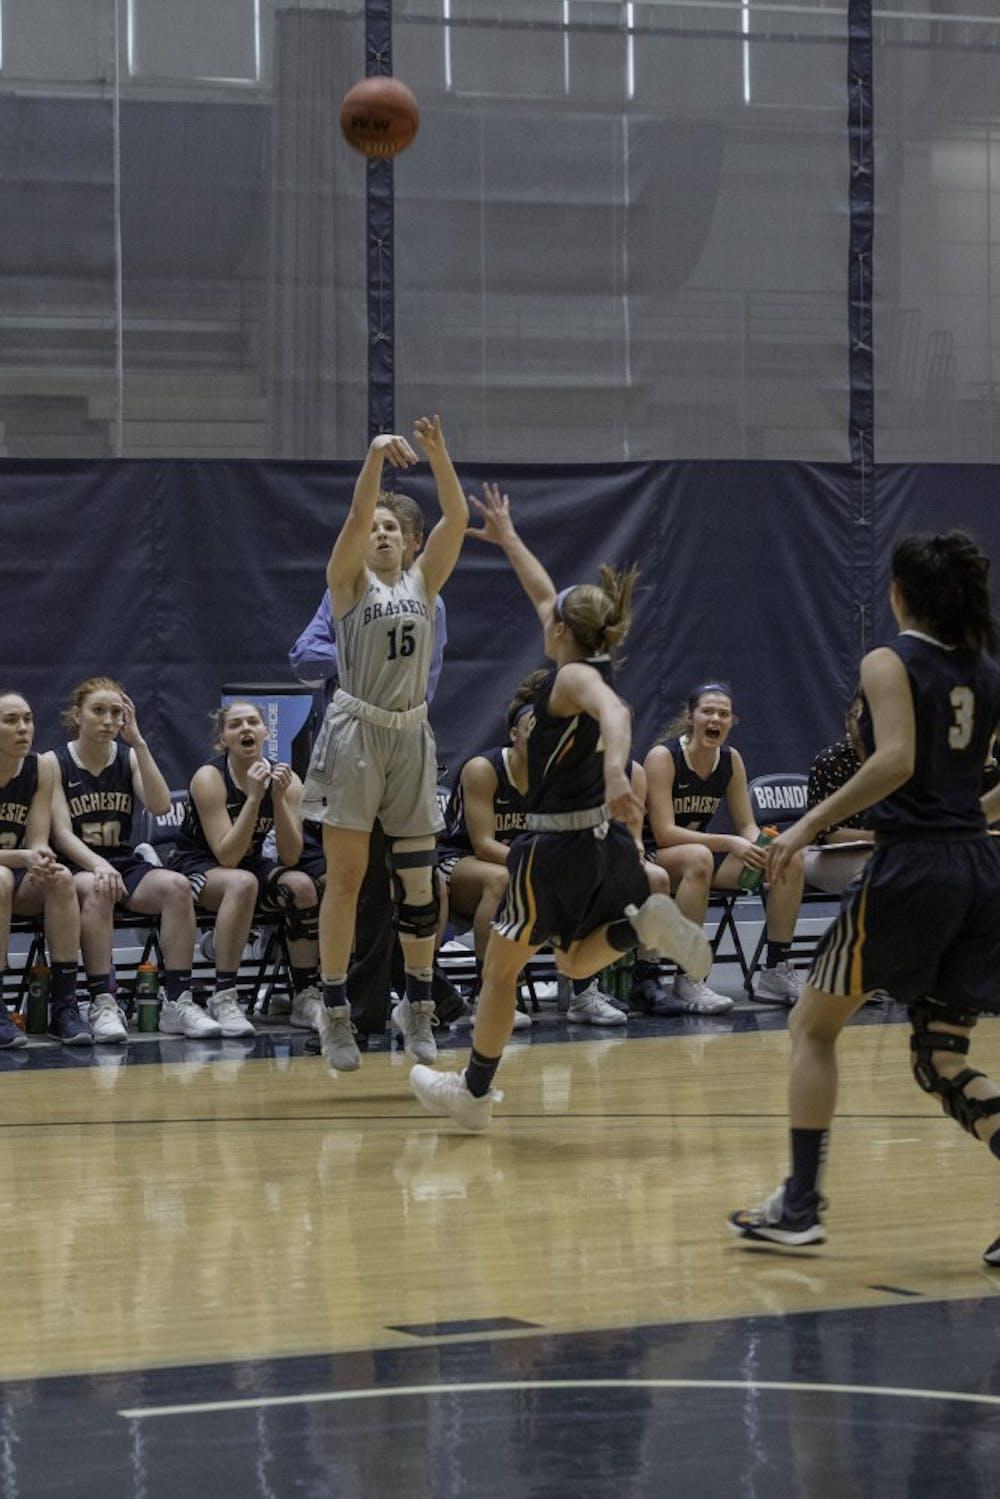 basketball-m-w-v-rochester-2-3-19-zb-0498